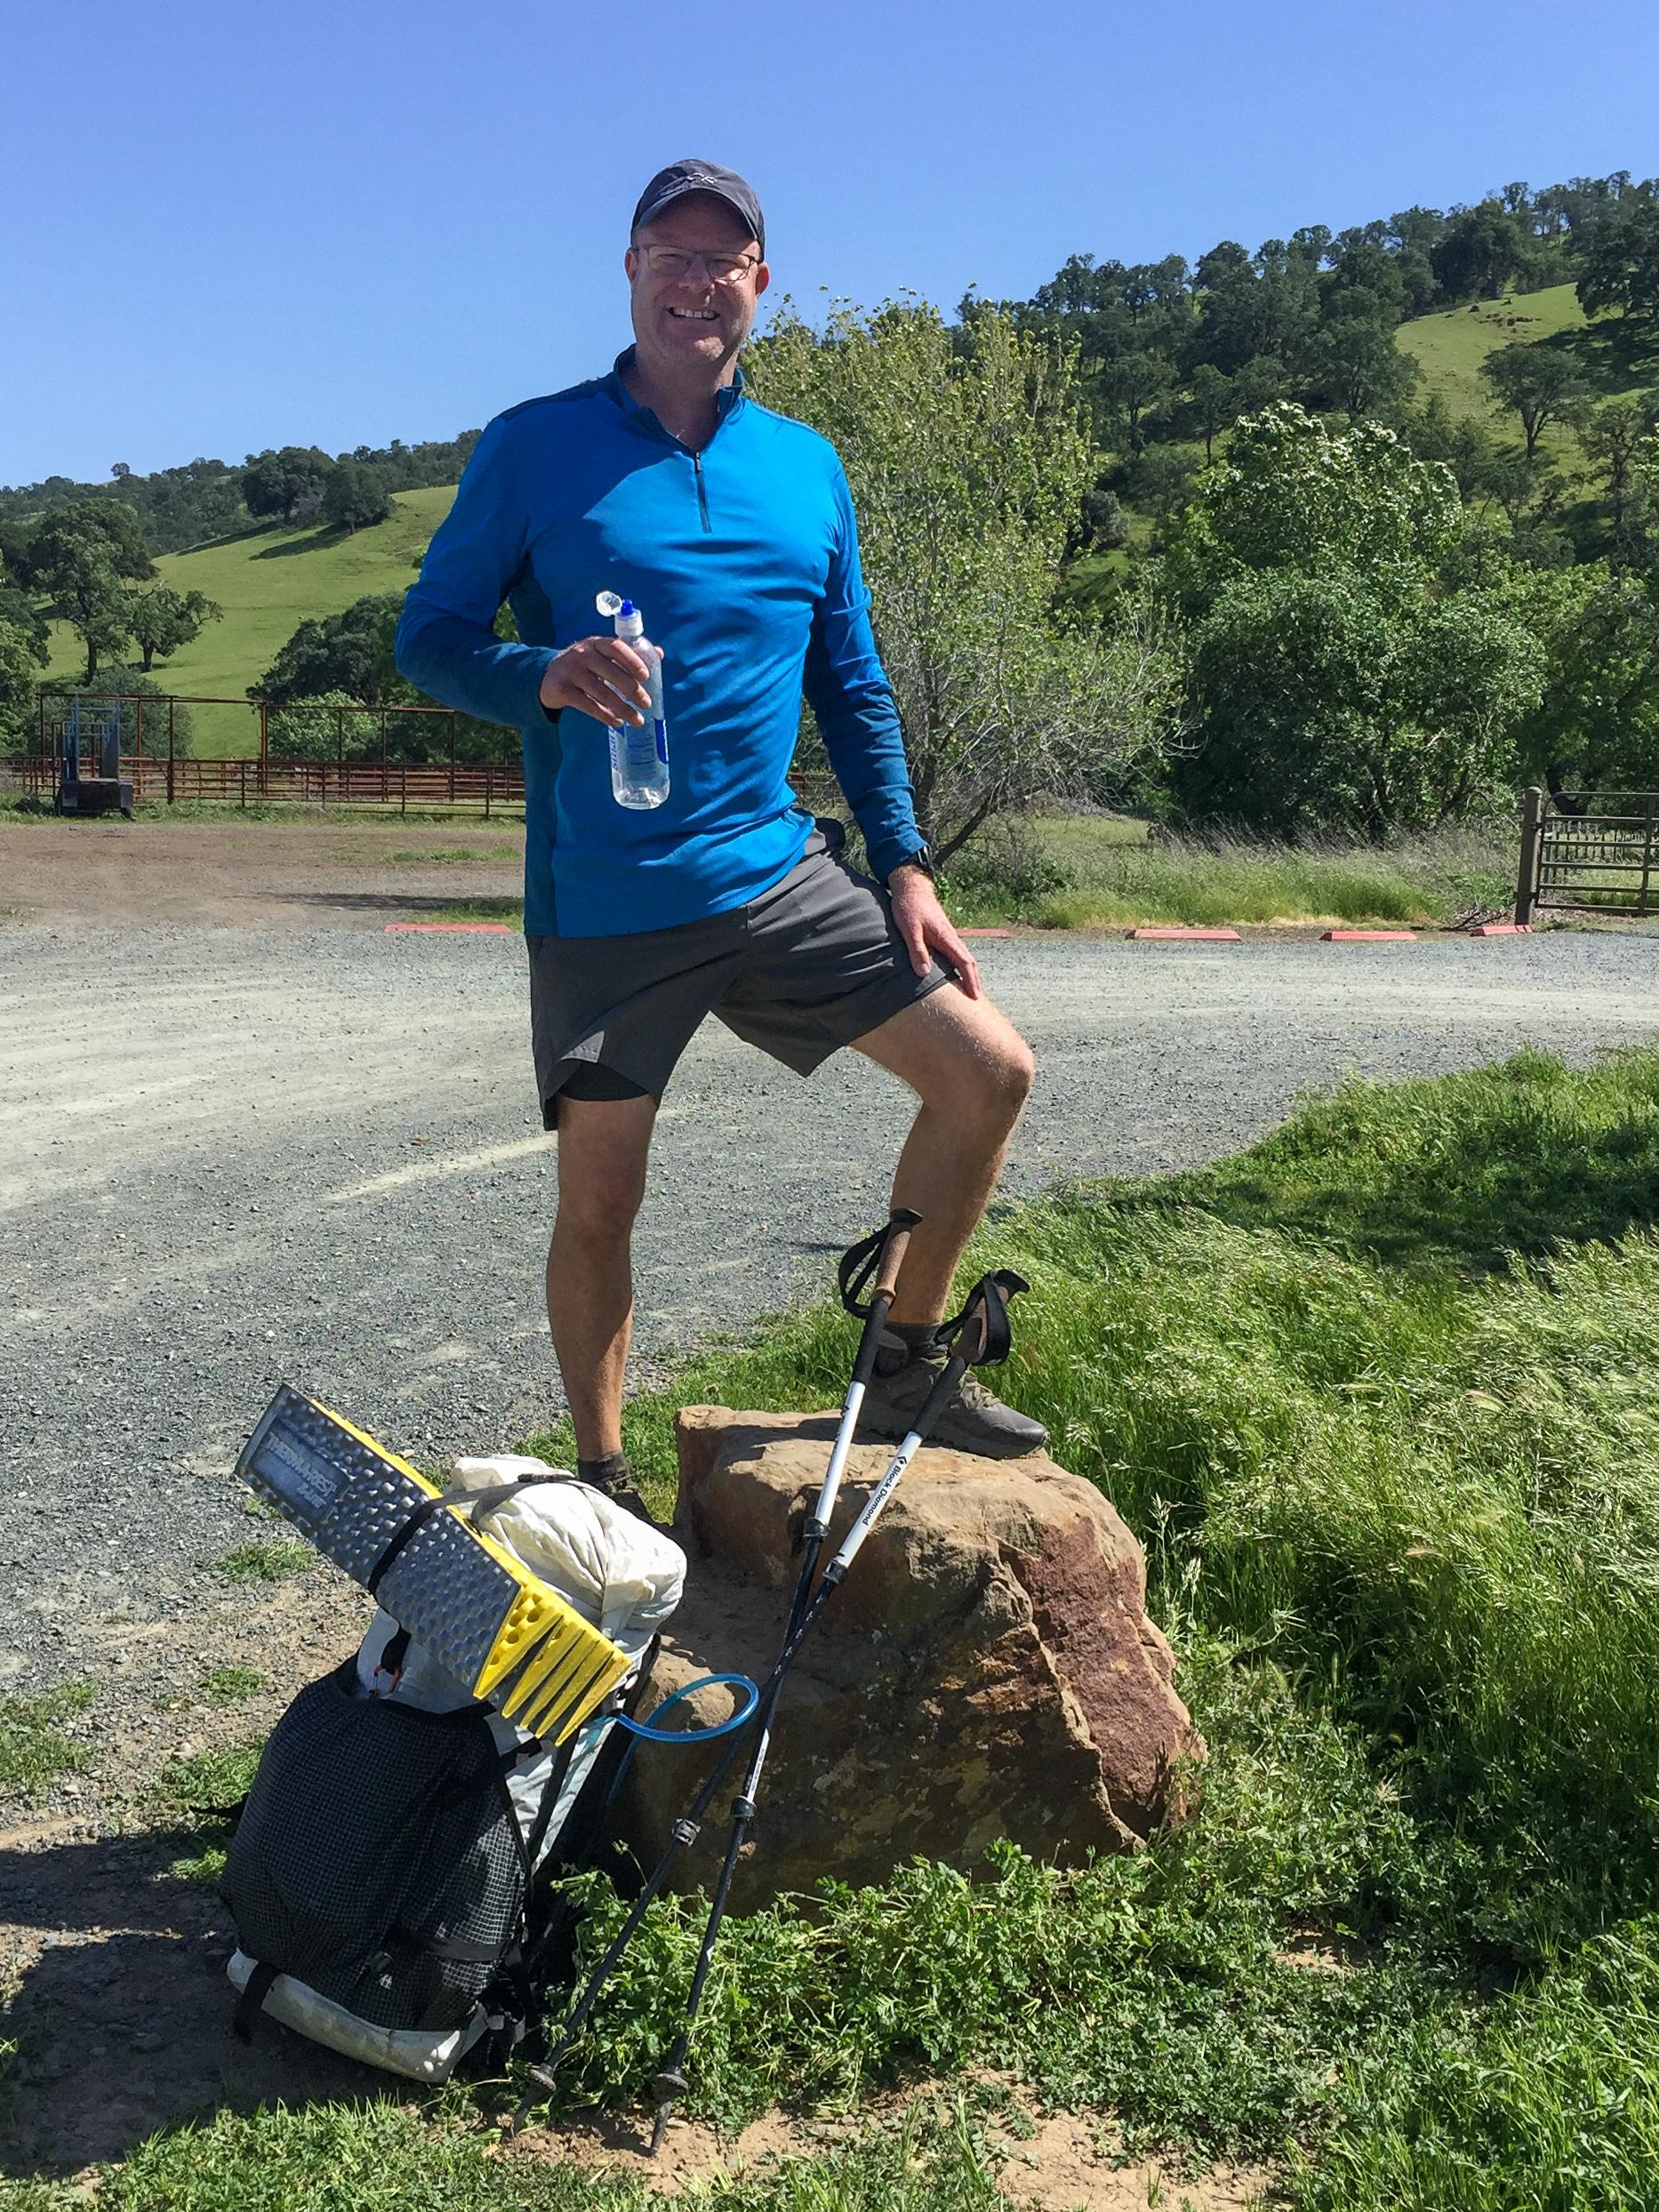 Weekend Warrior – Thru-Hiking the Mount Diablo Range